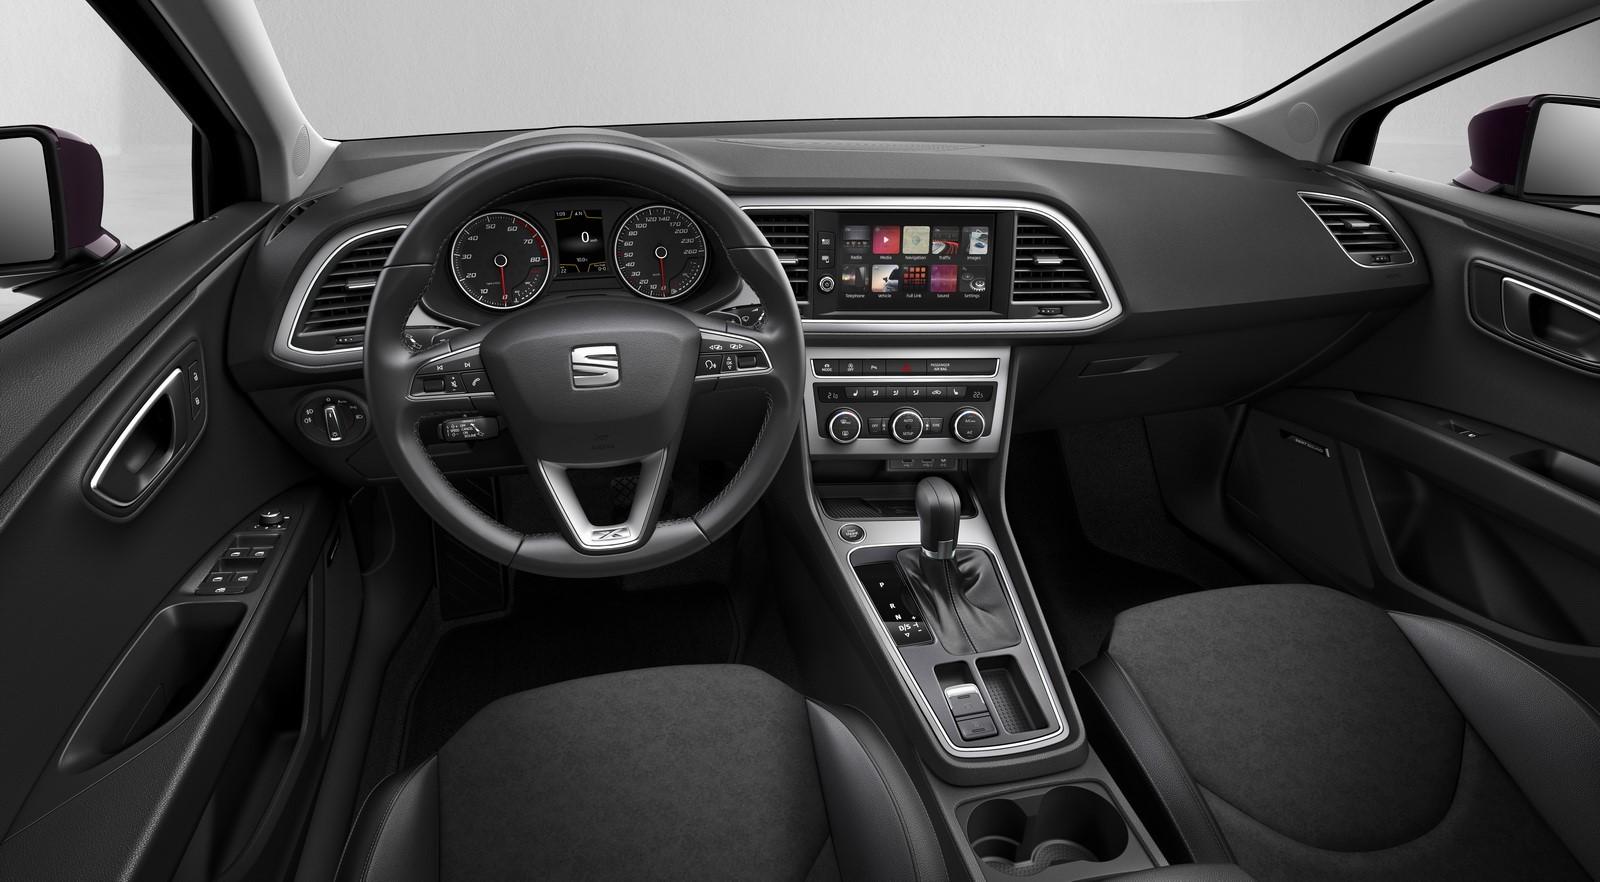 Seat Leon facelift 2017 (9)